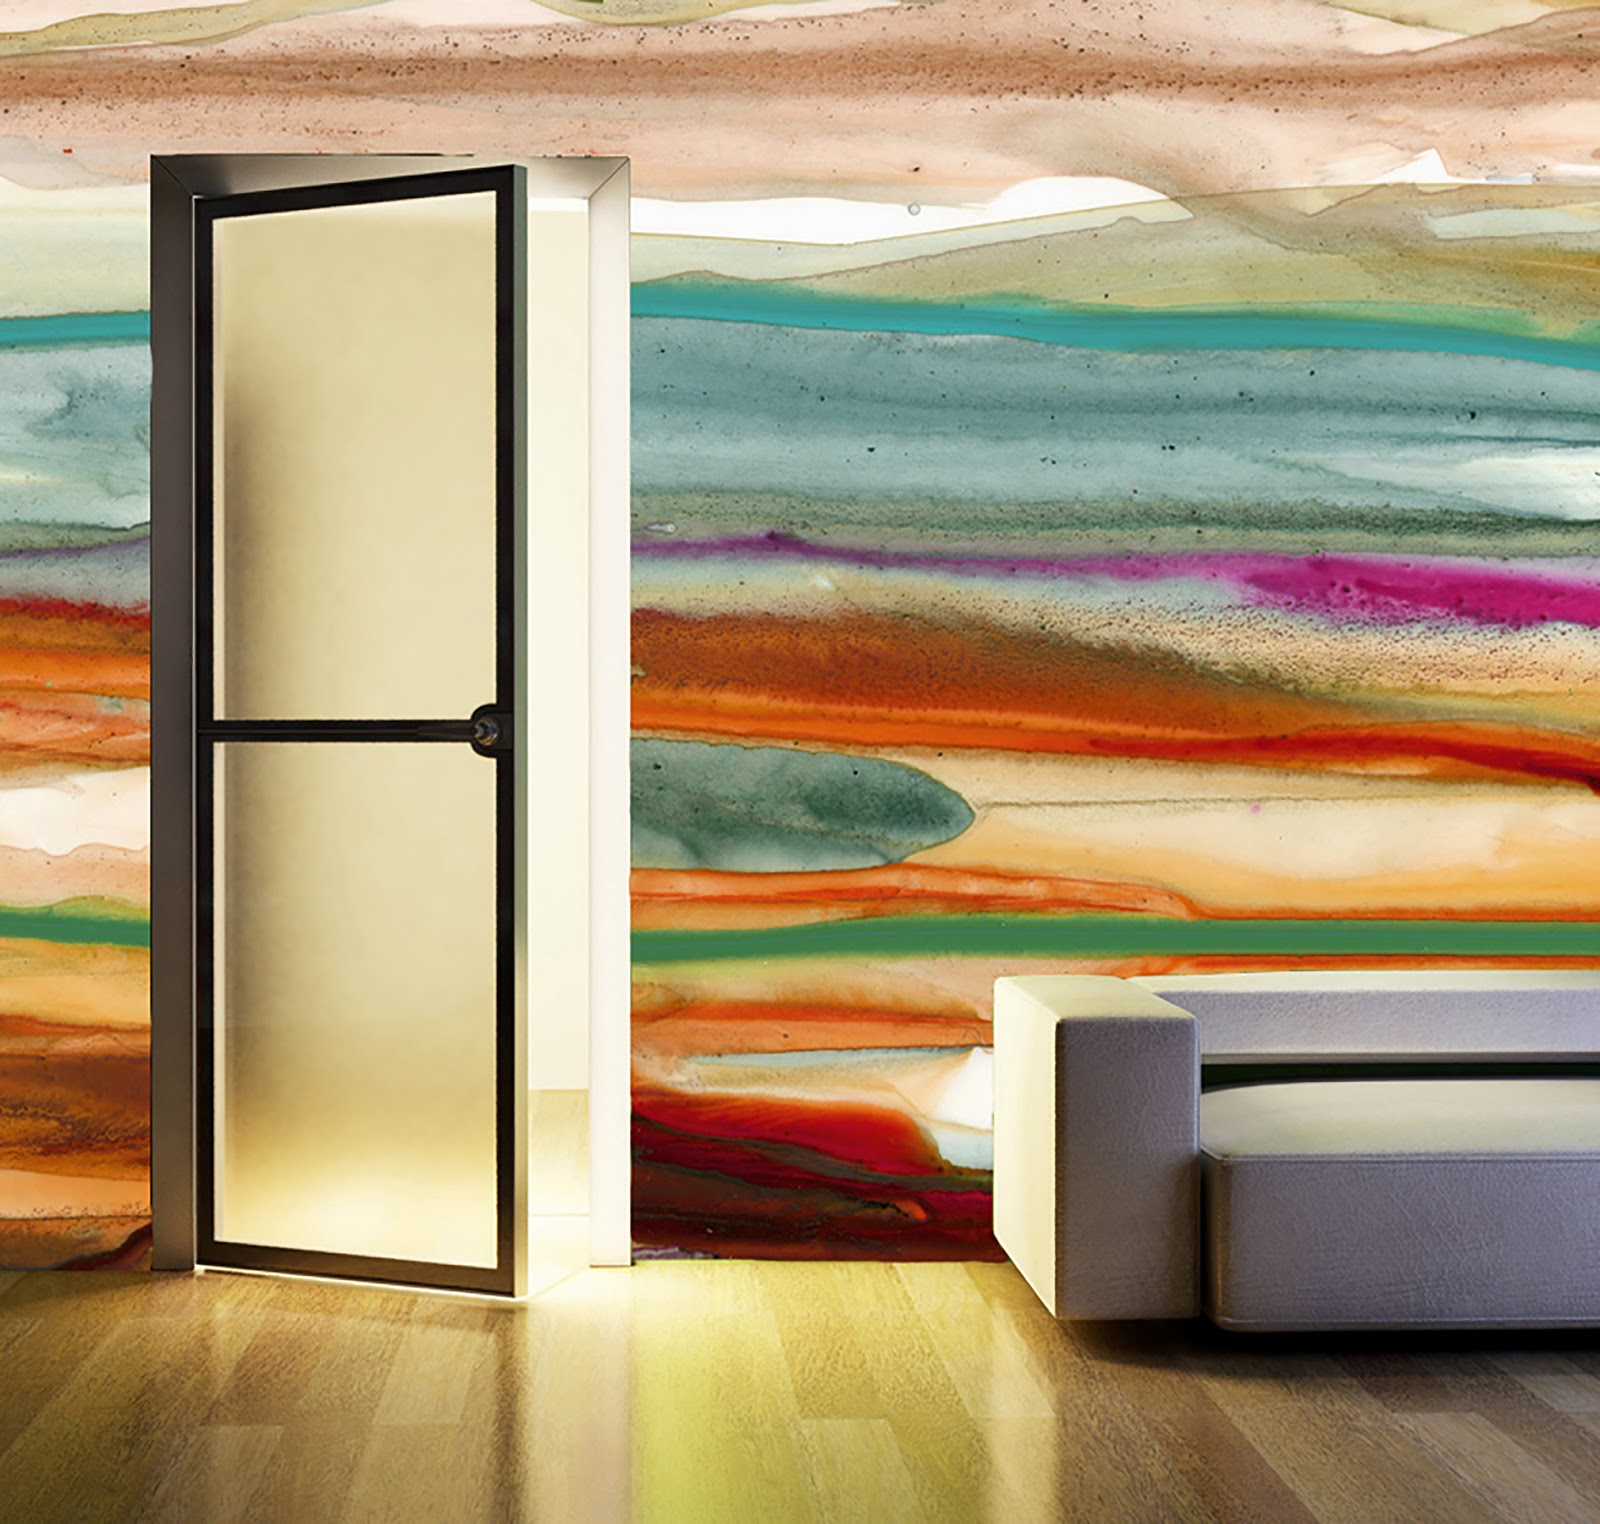 ModDesignGuru - Thinking-Outside-the-Box Design: Watercolor Trends in home design